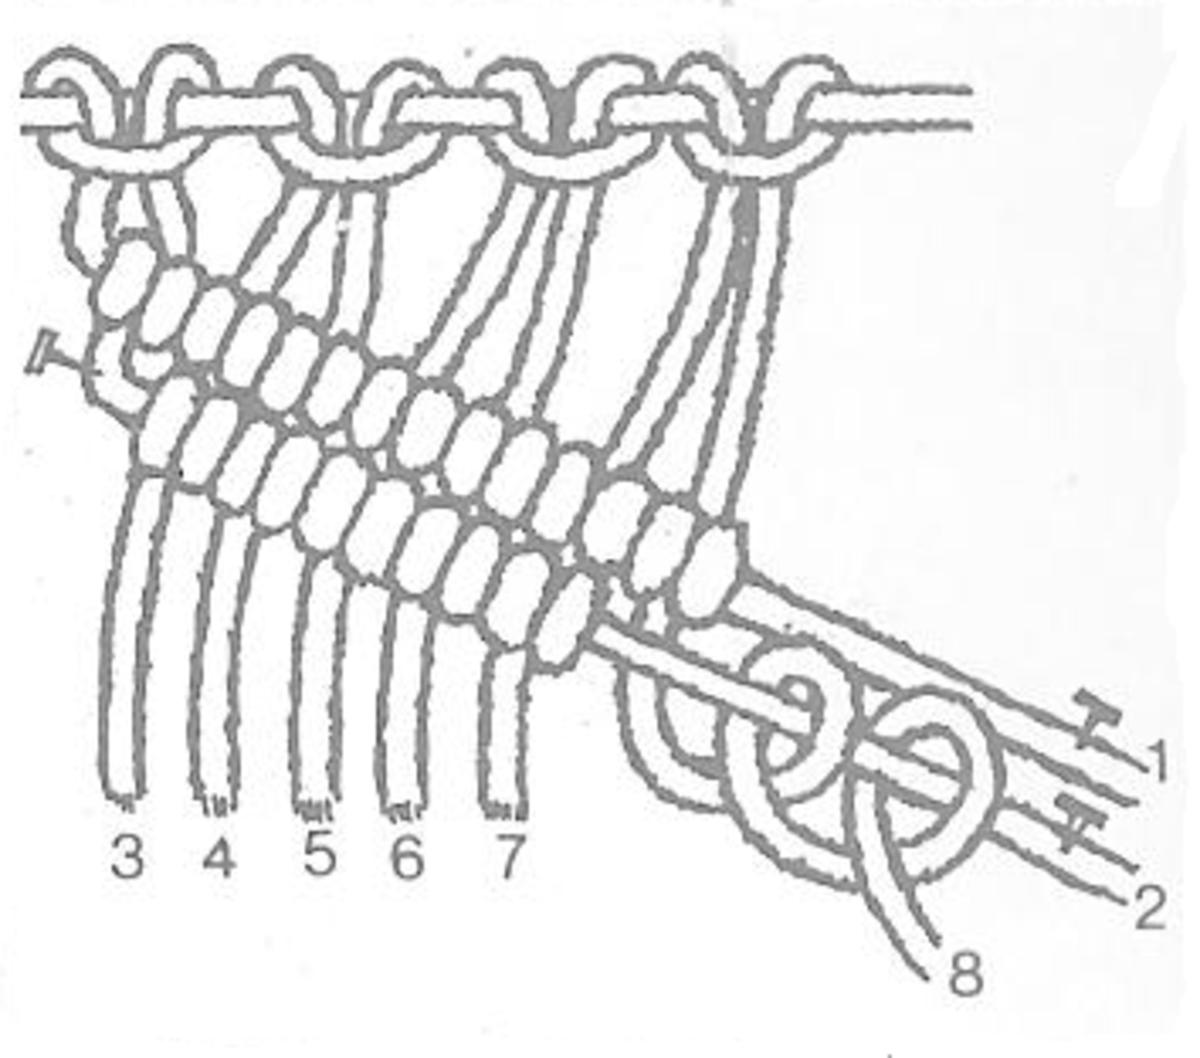 Figure 12 - Diagonal Cording